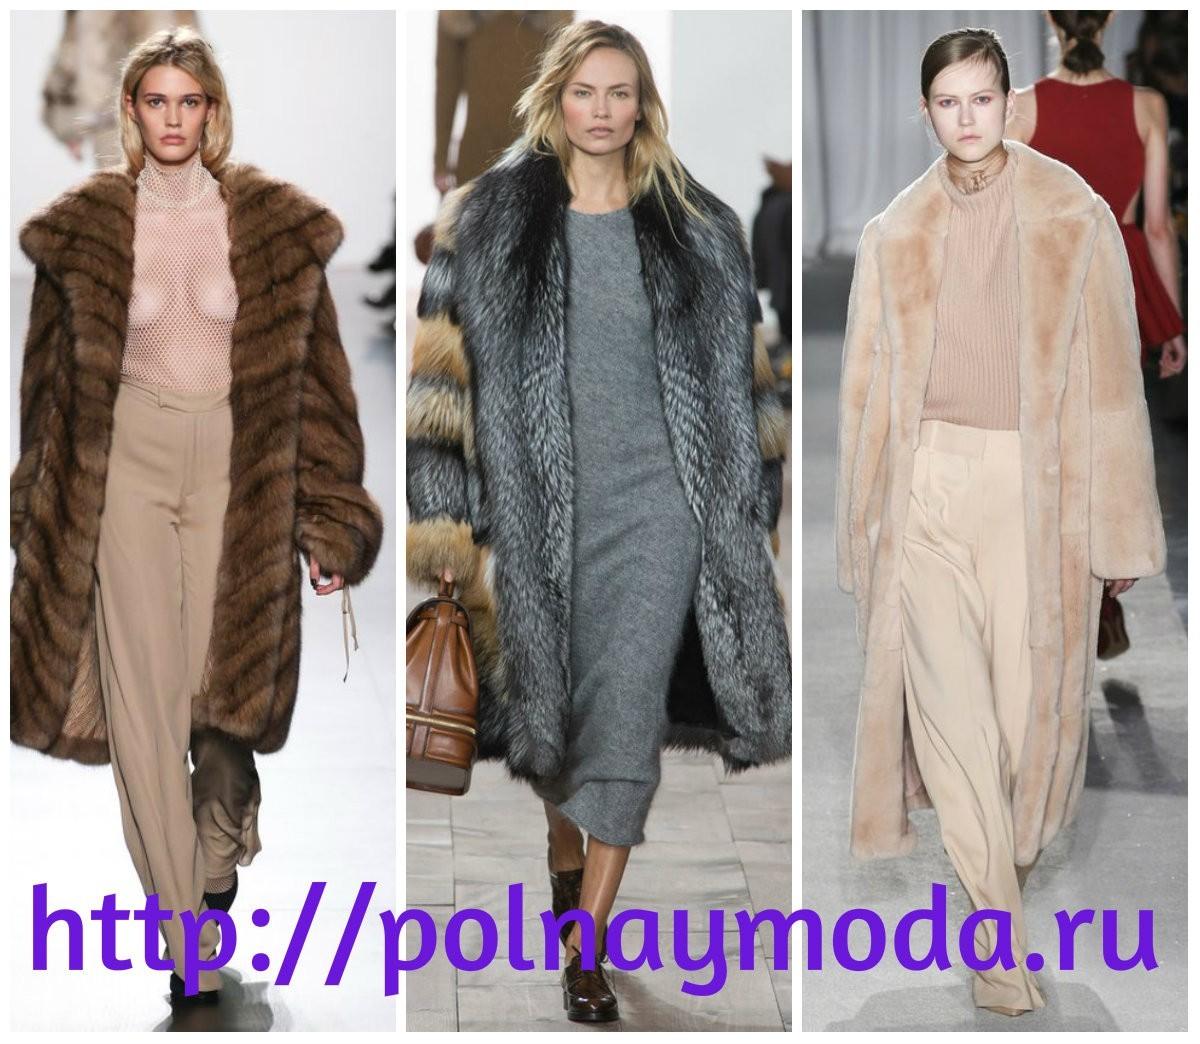 Шуба-халат из меха, мода 2018